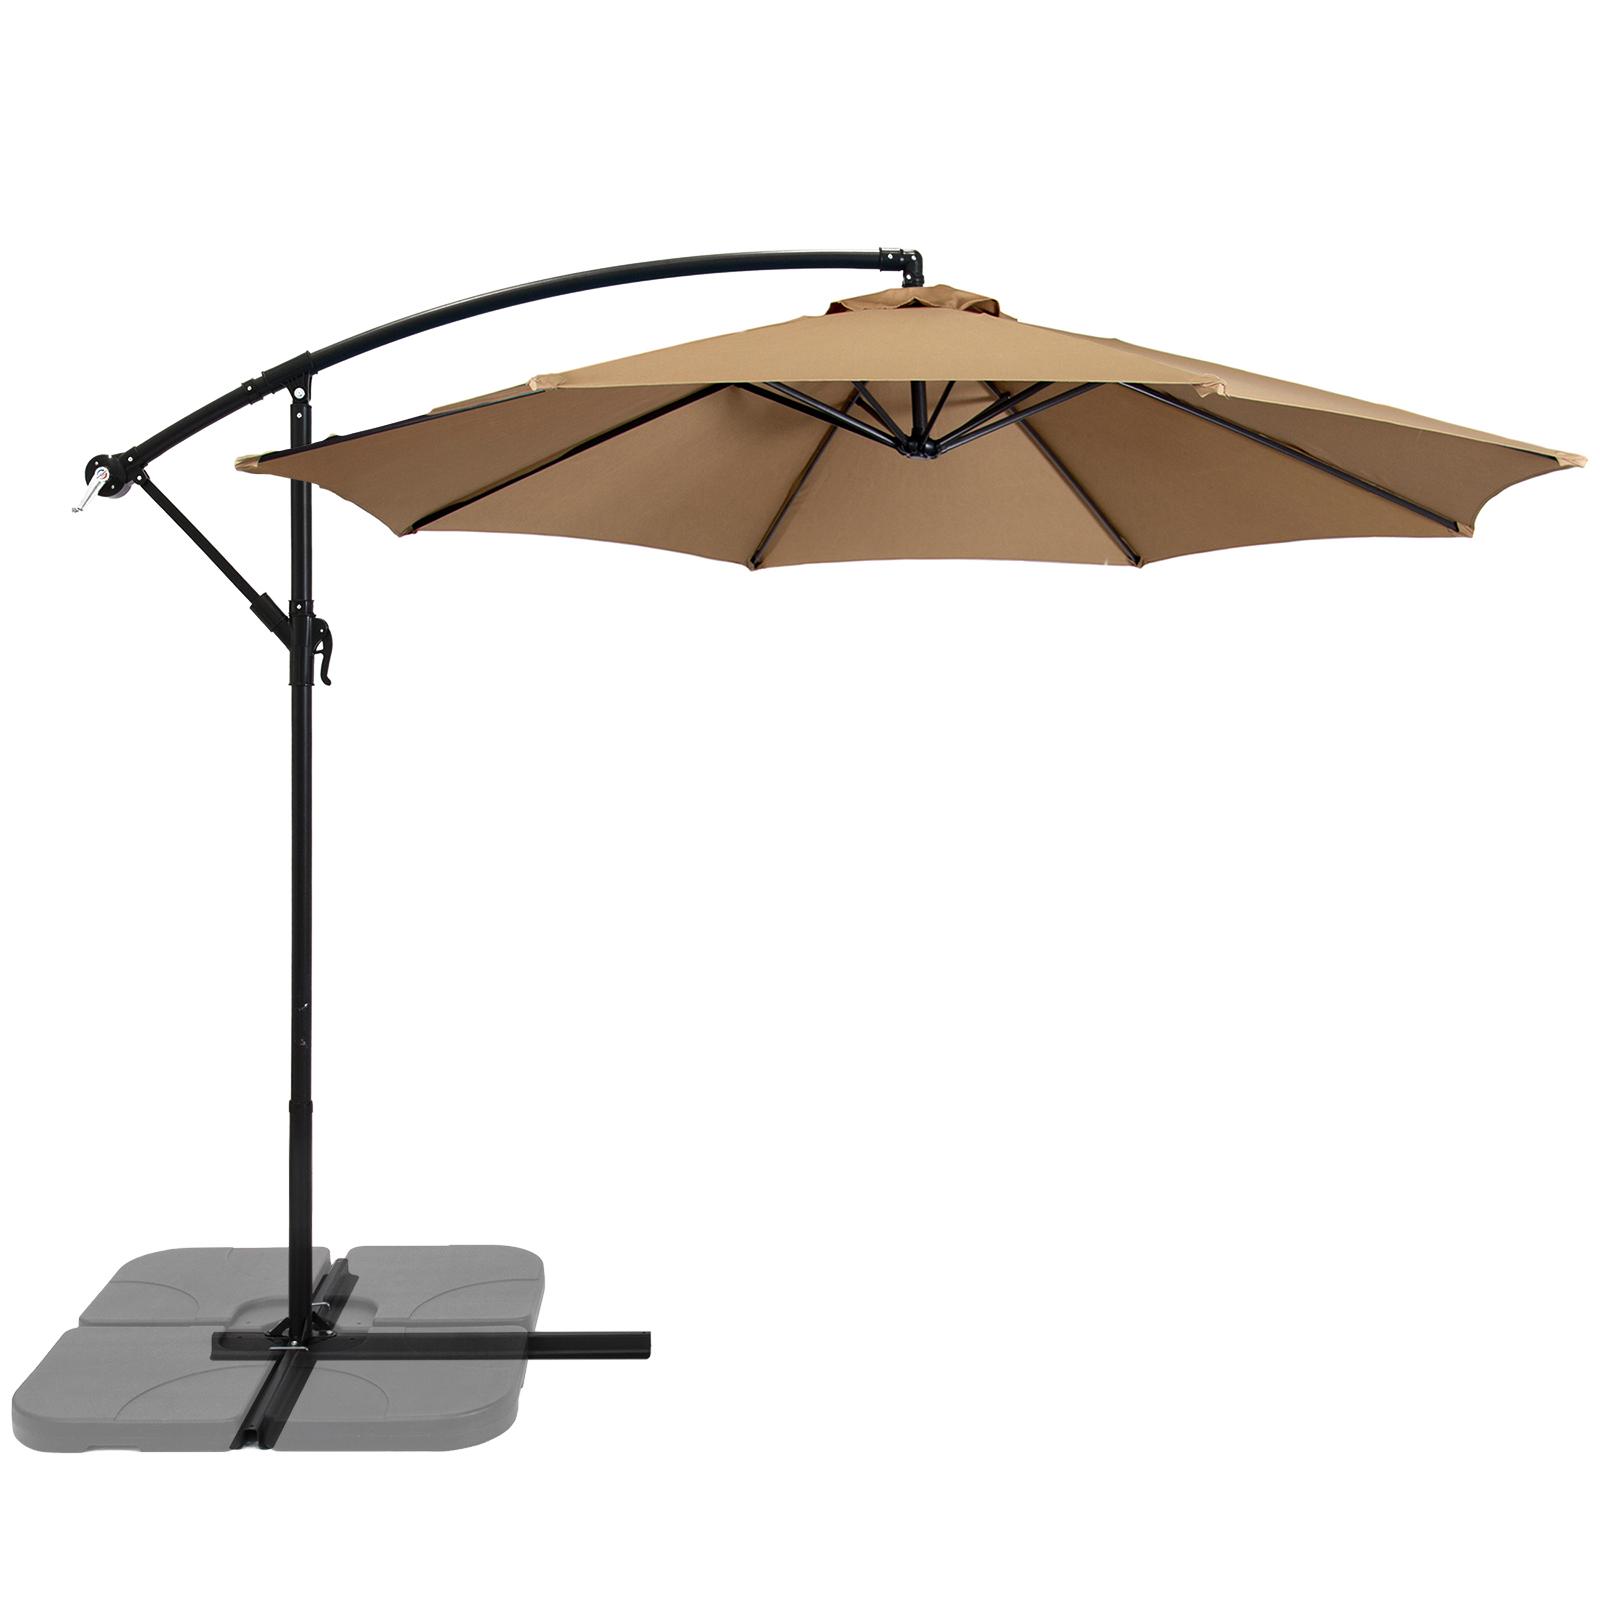 Patio Umbrella Offset 10' Hanging Umbrella Outdoor Market